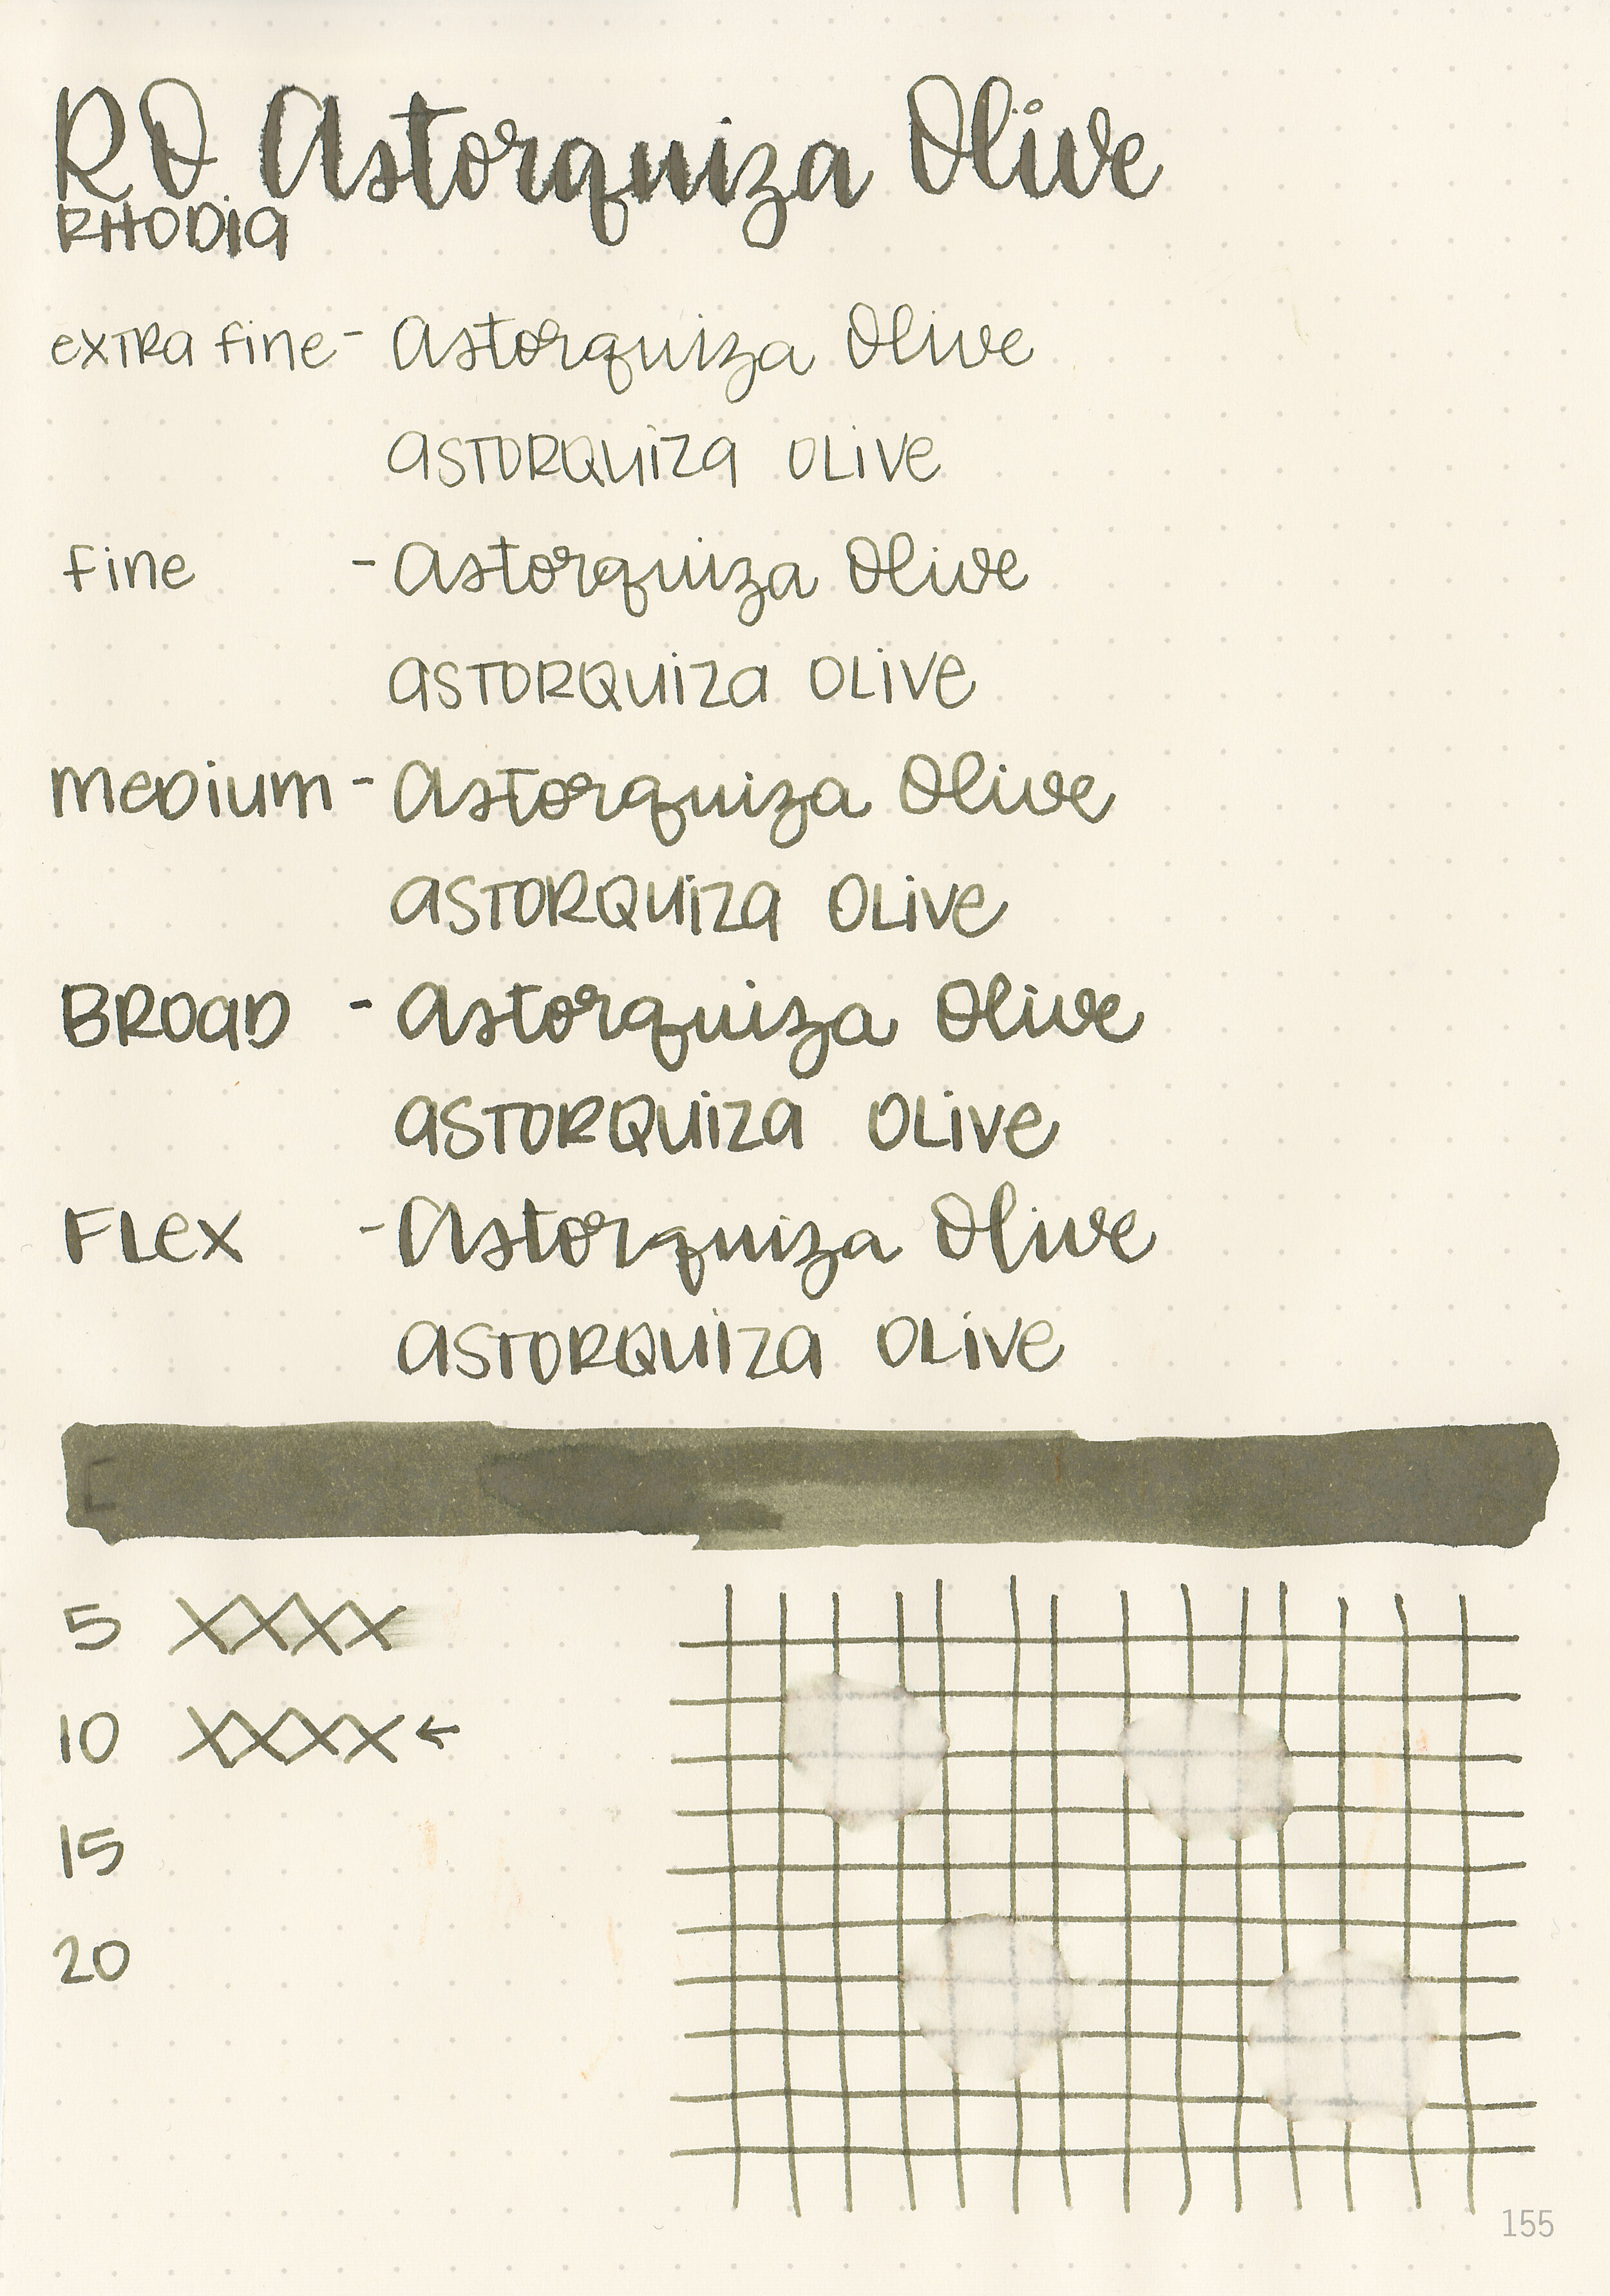 ro-astorquiza-olive-5.jpg